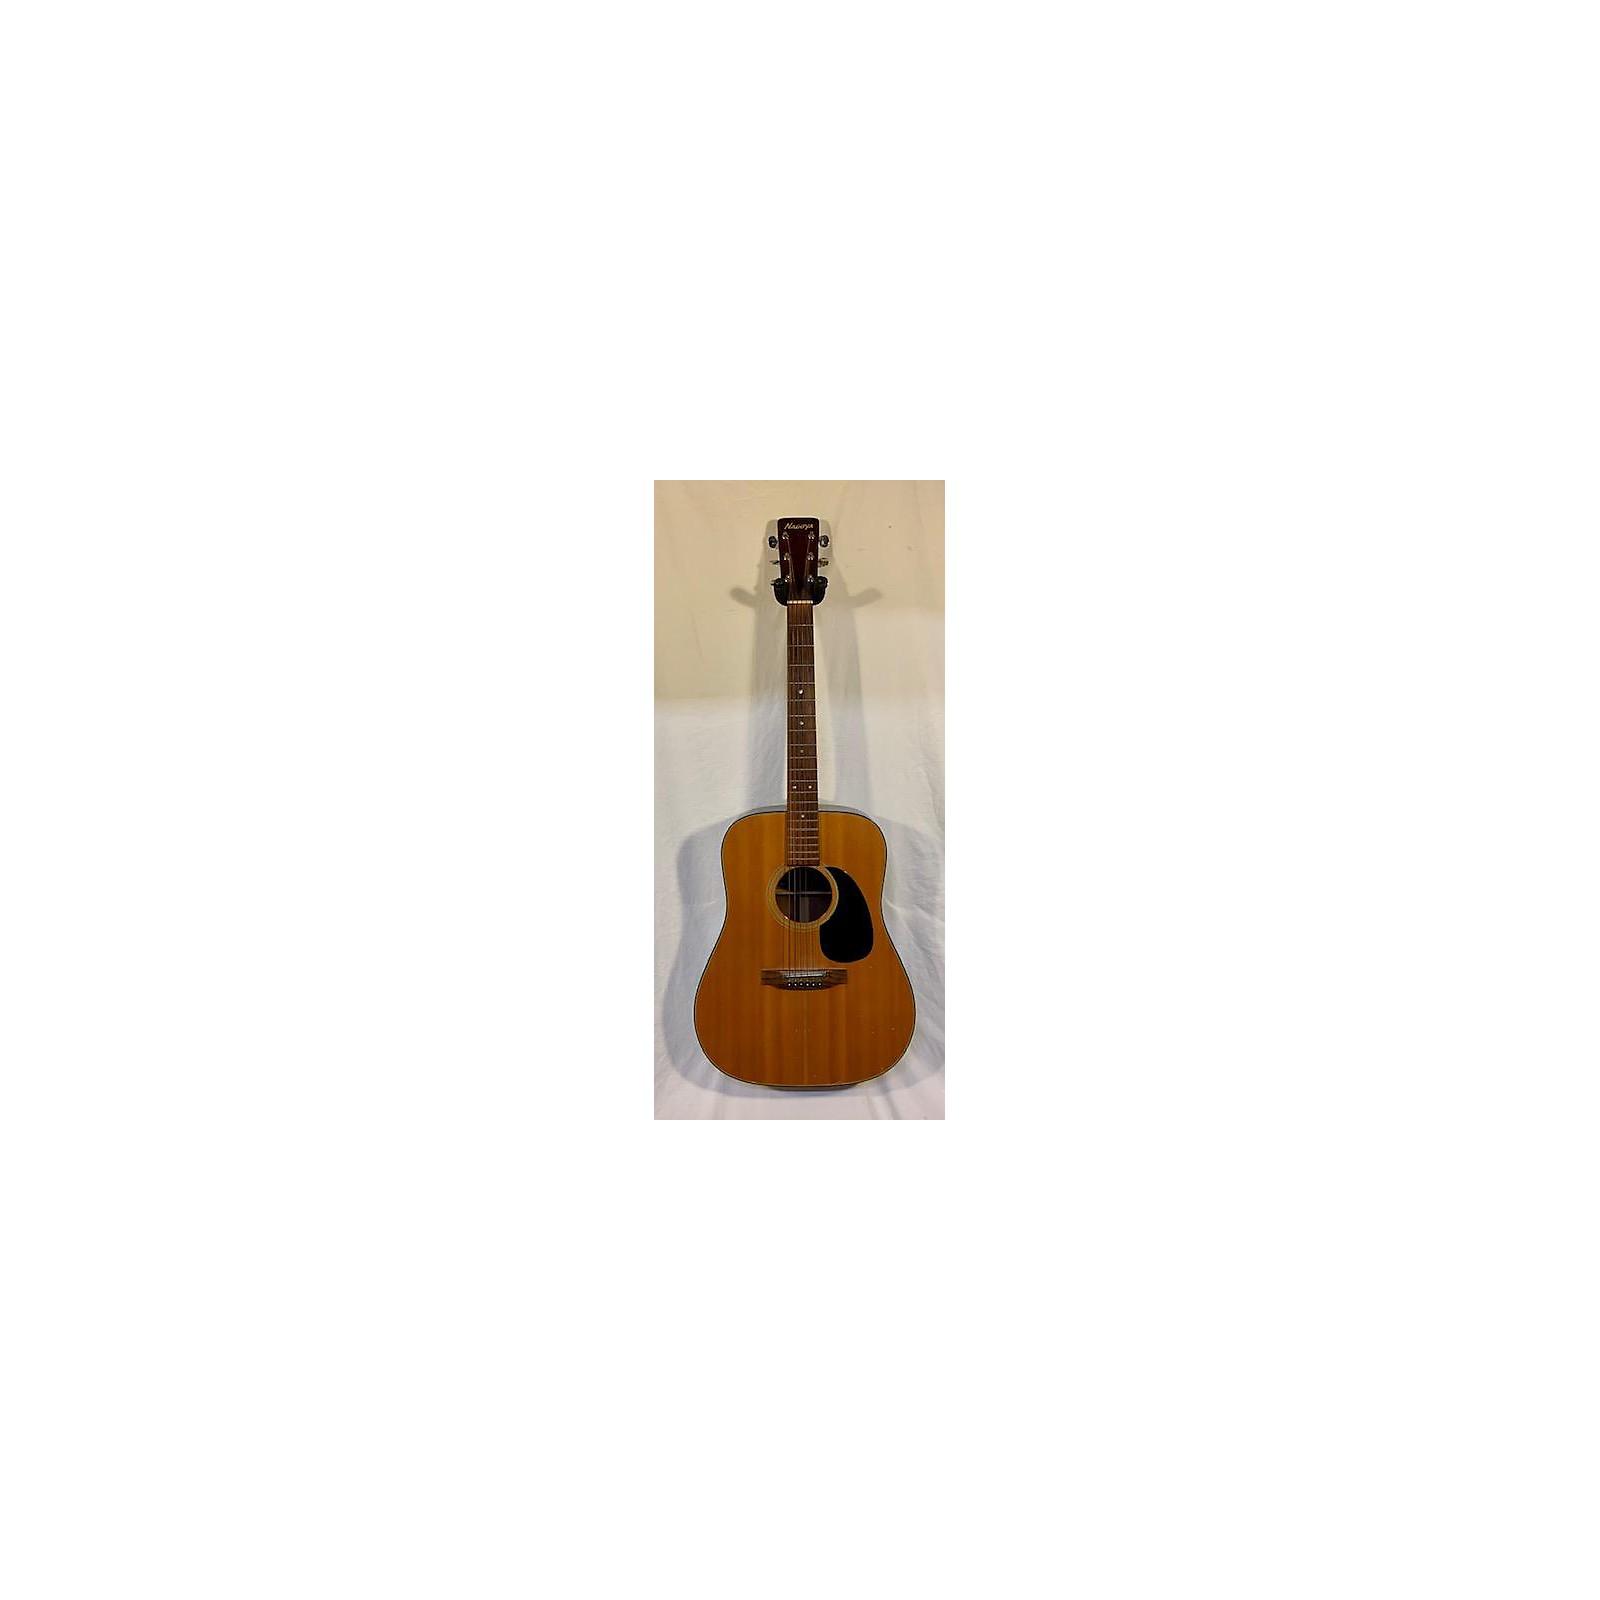 In Store Used Used Nagoya N18 Antique Natural Acoustic Guitar